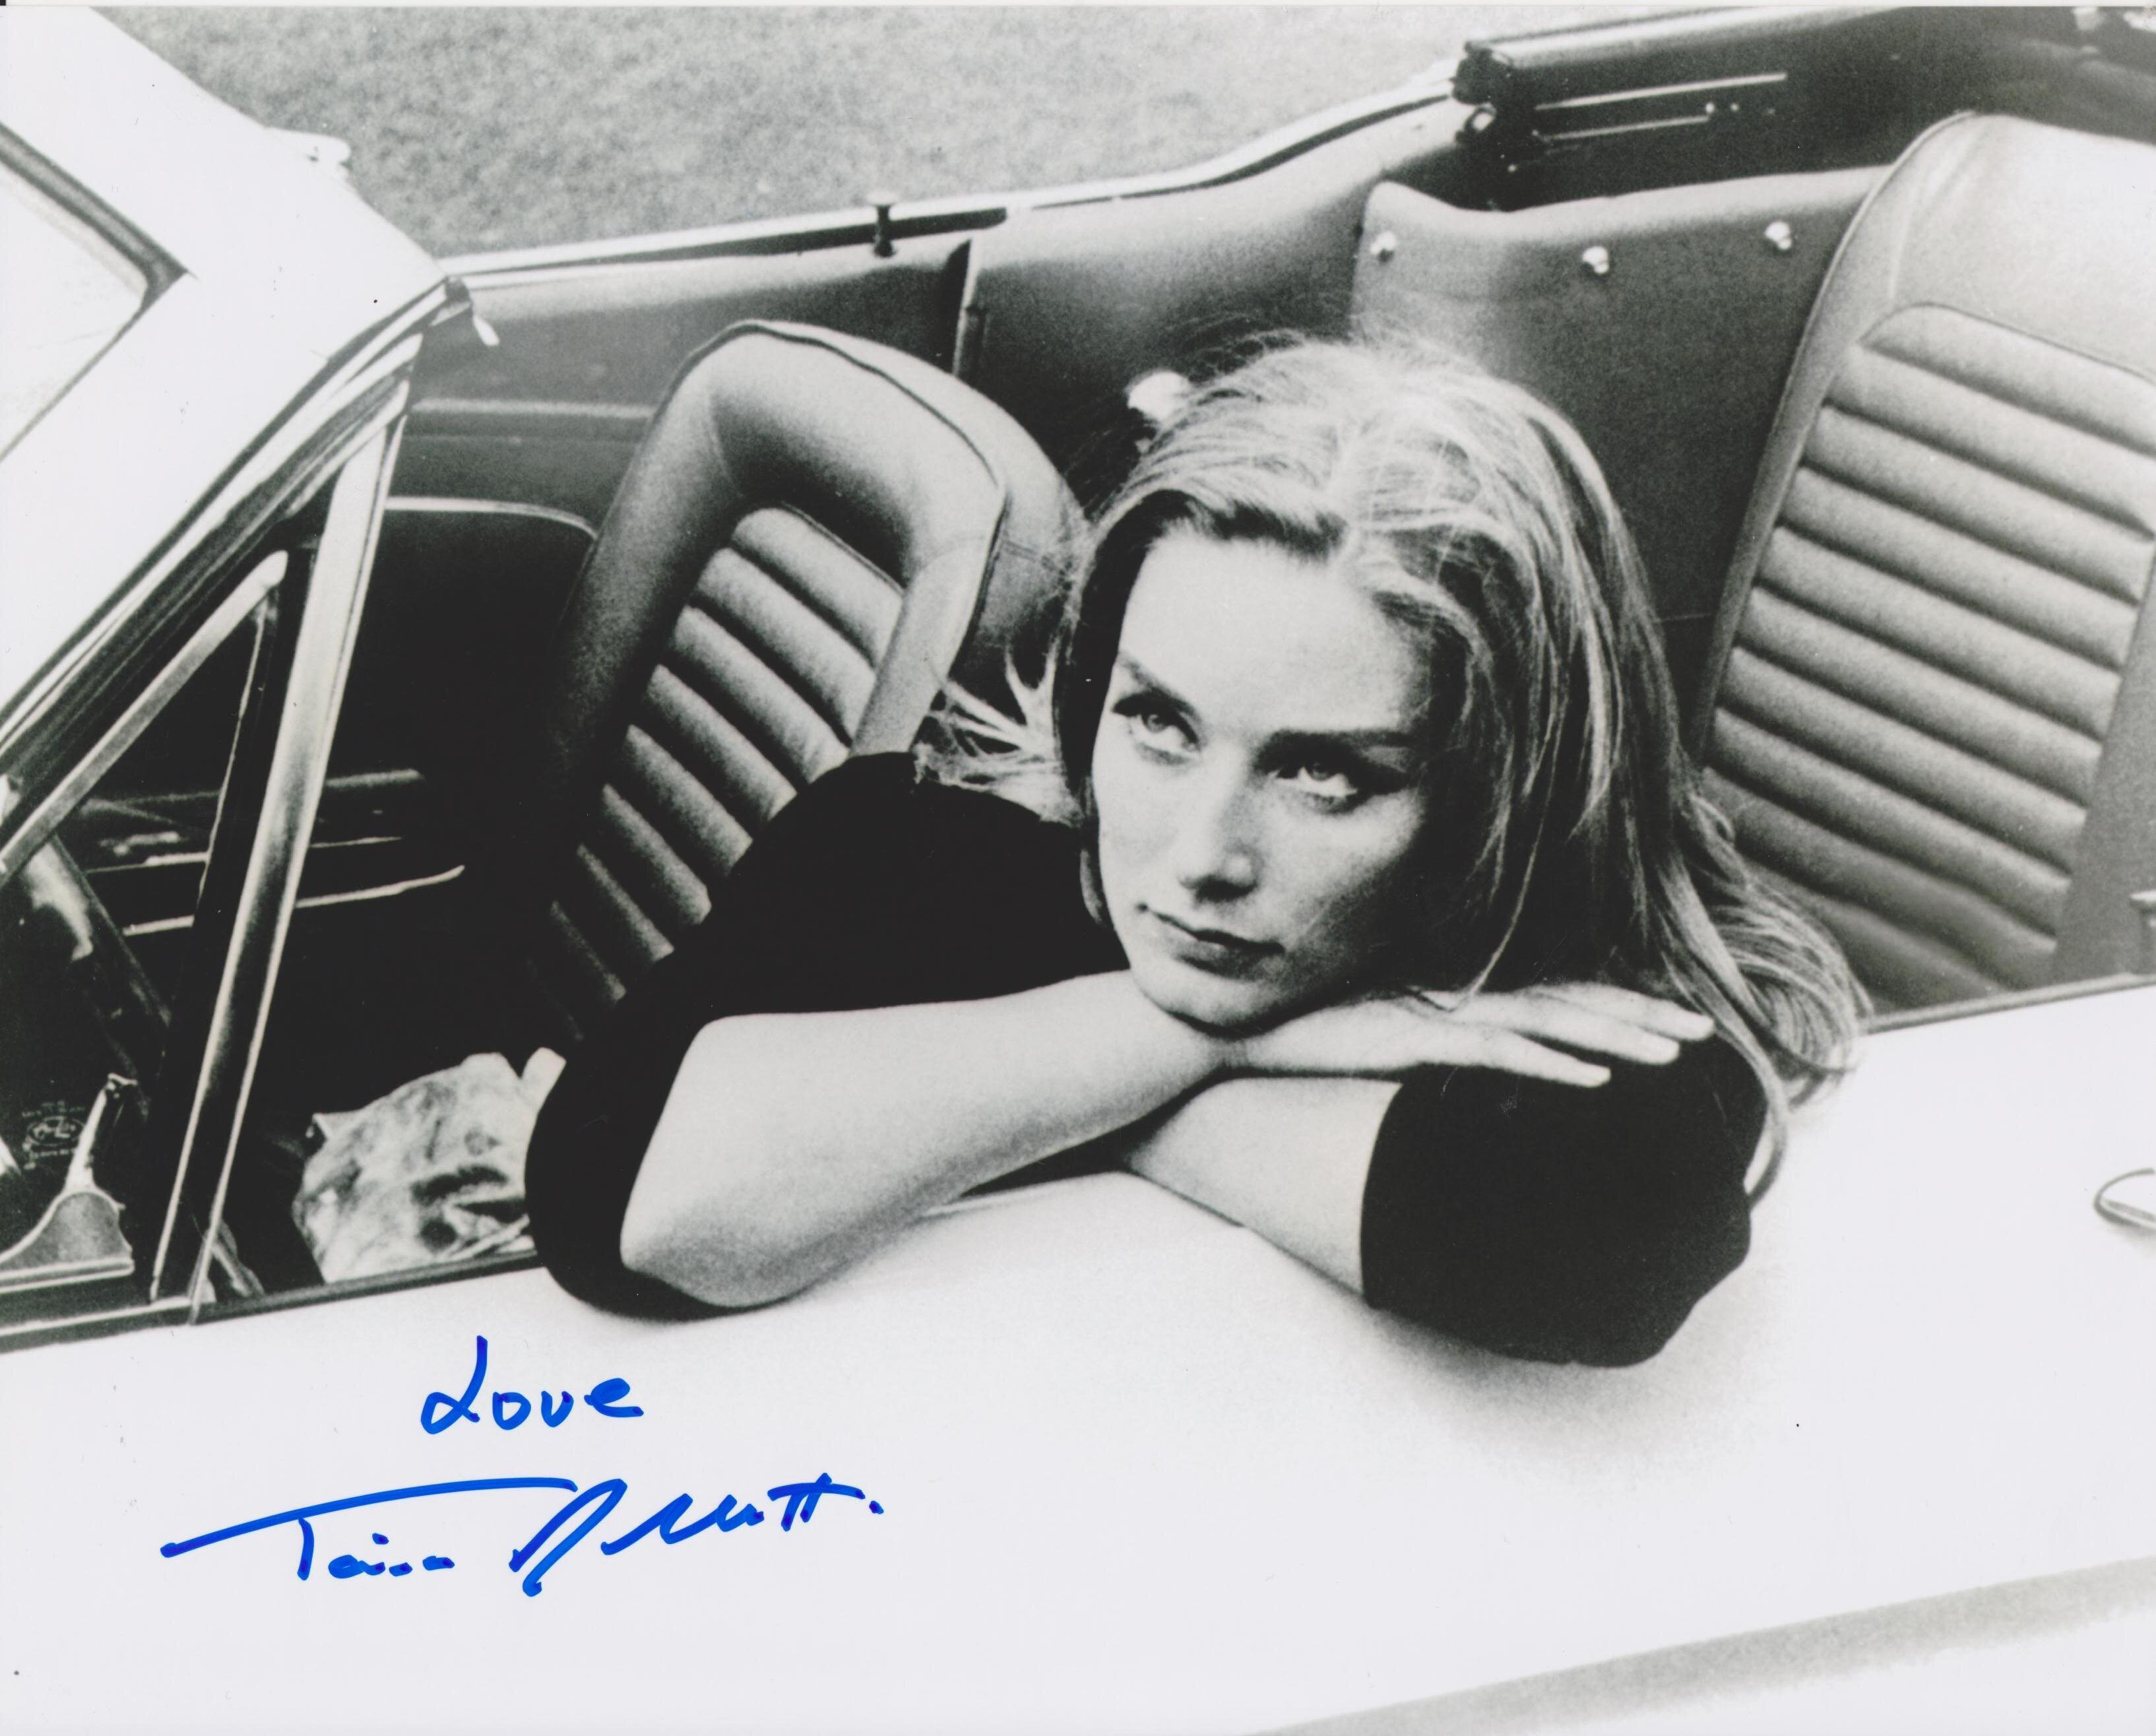 Tania Mallet: Tania Mallet Goldfinger # 16